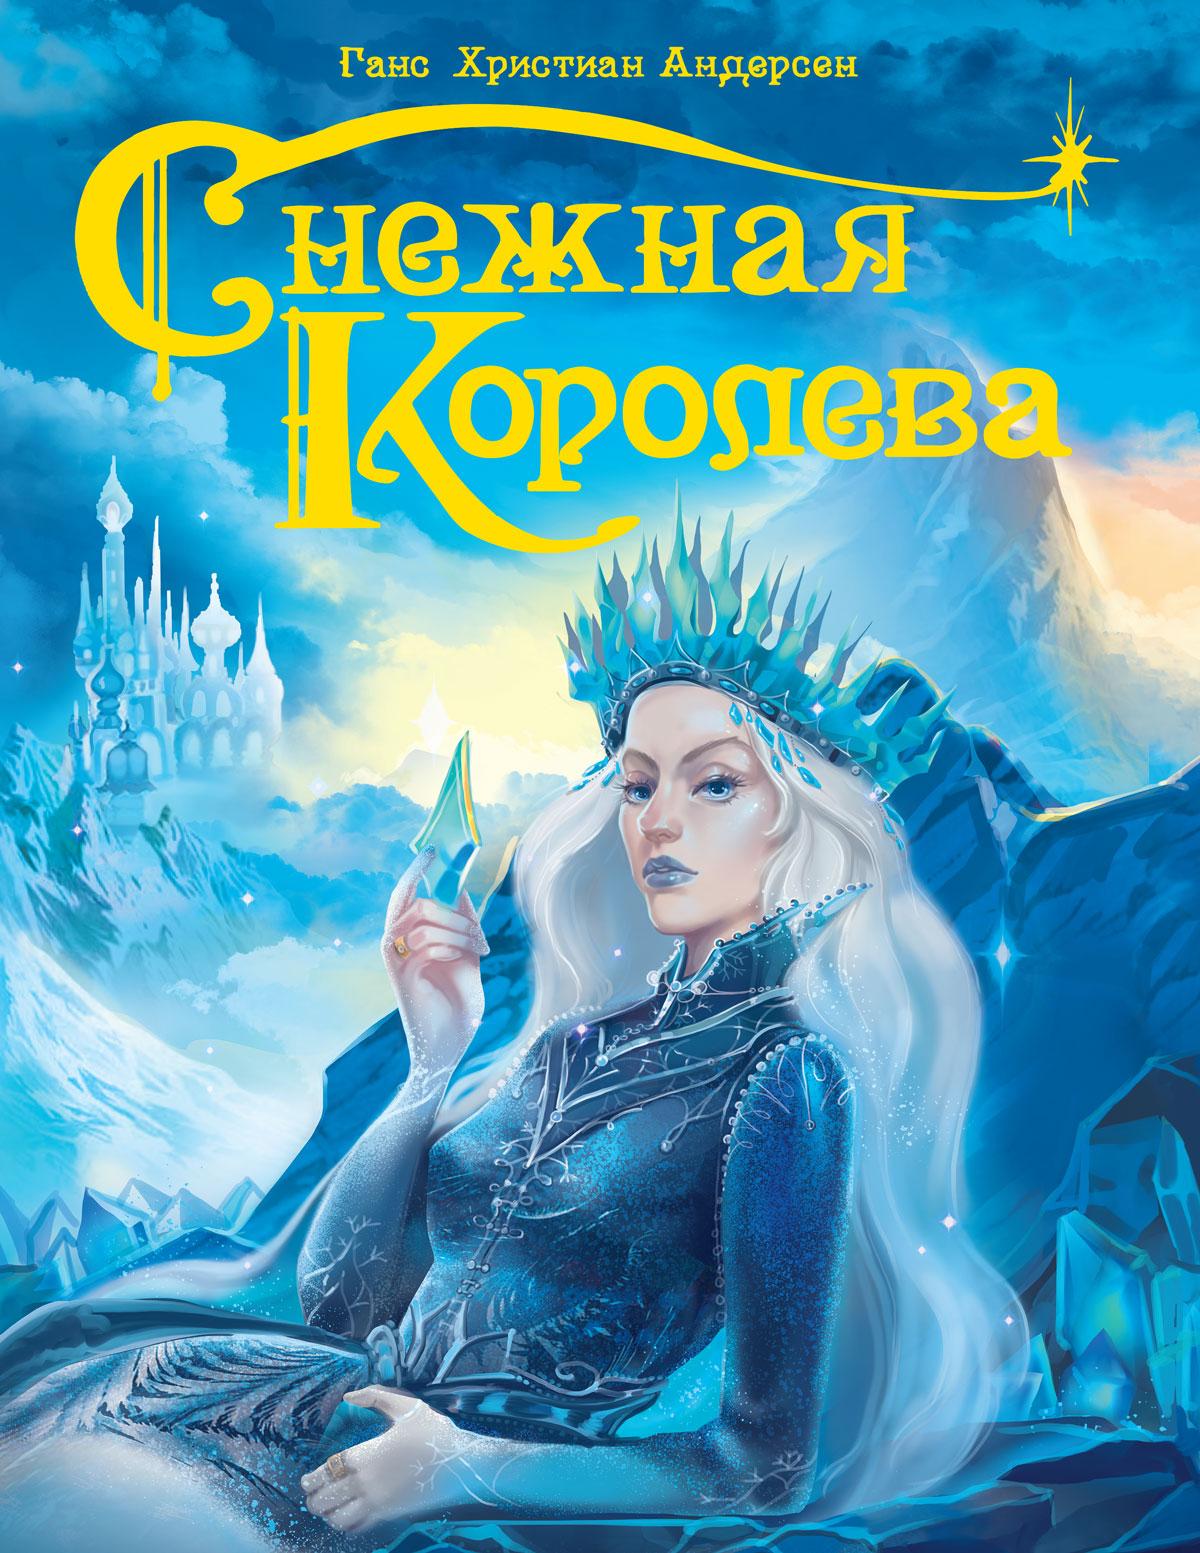 Книга. Снежная Королева.  220х280